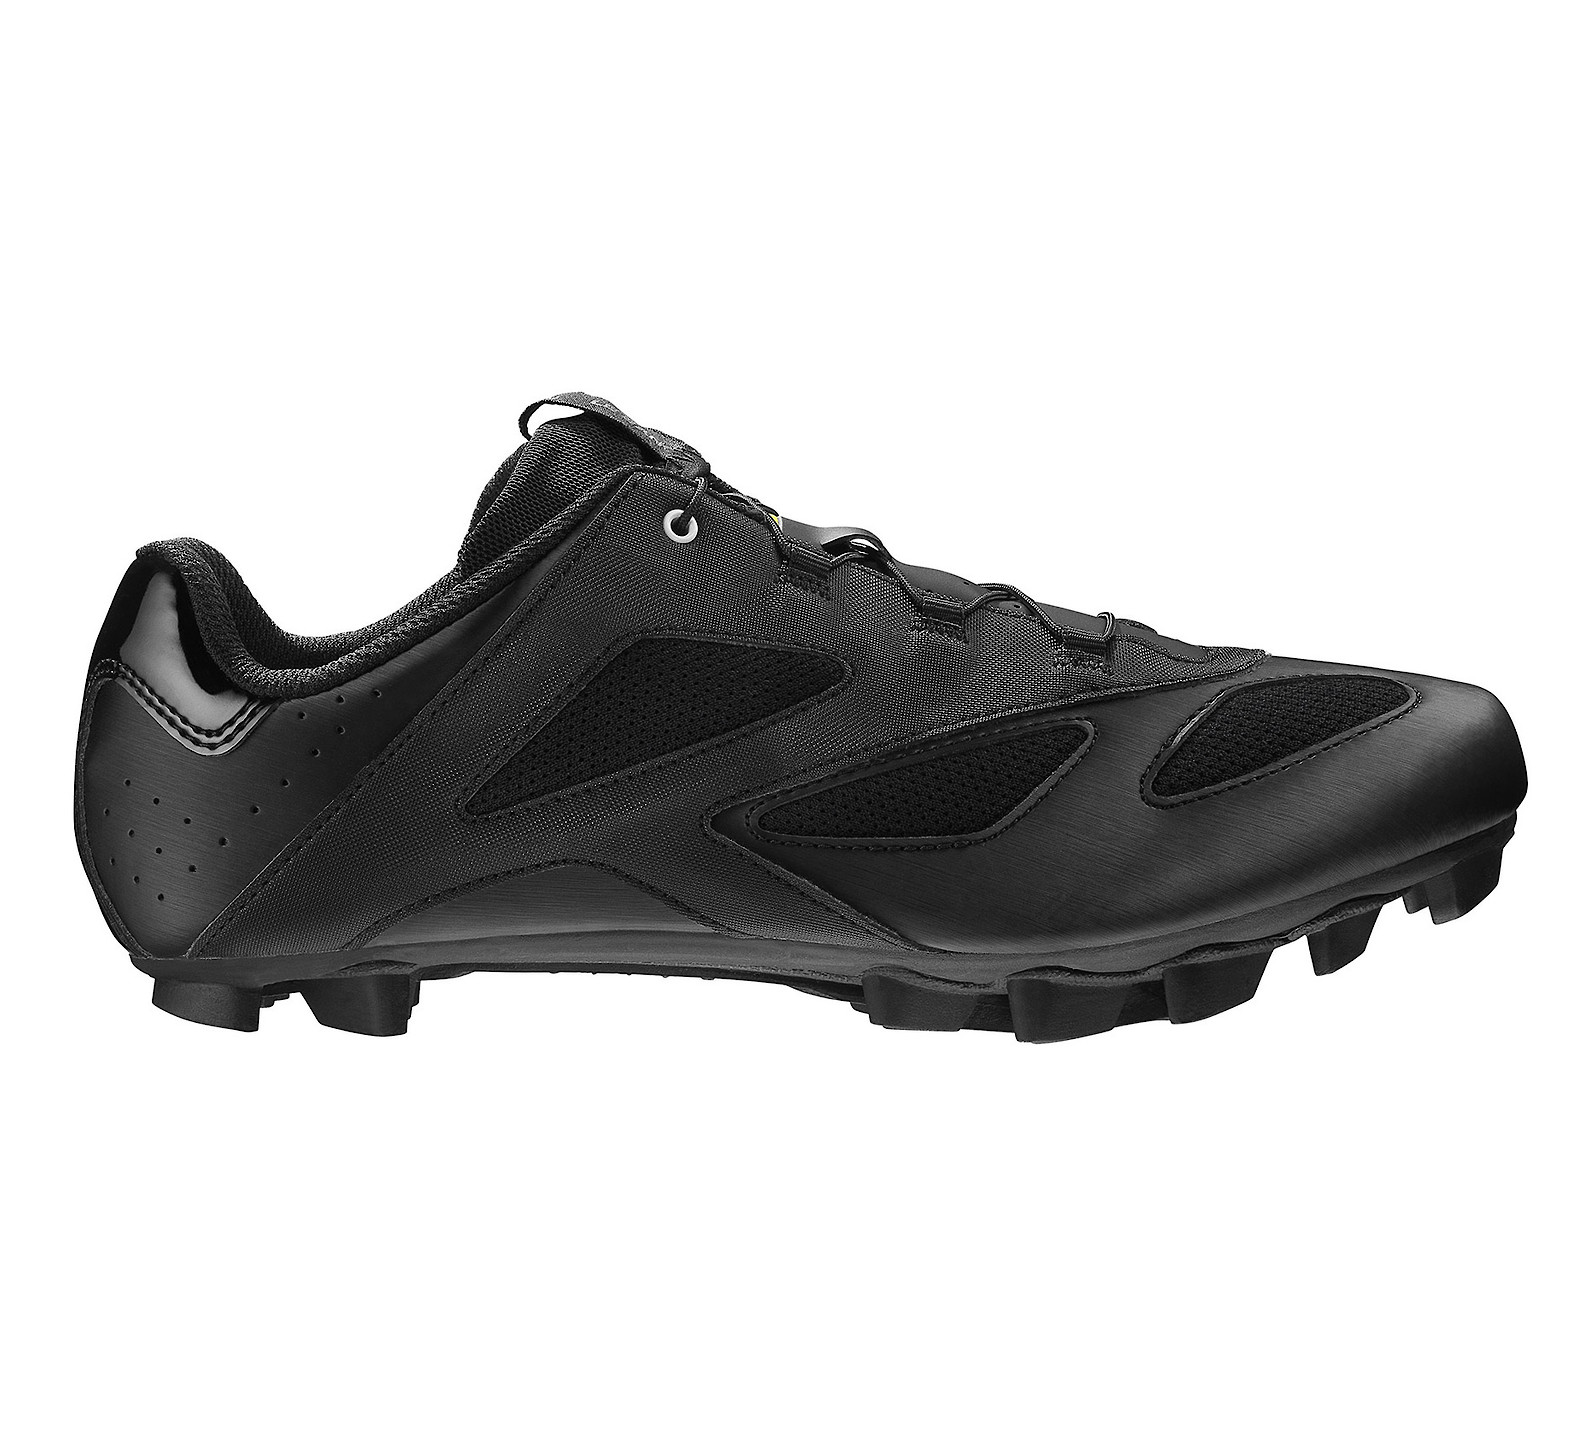 Mavic Crossmax Shoe (Black/Black)